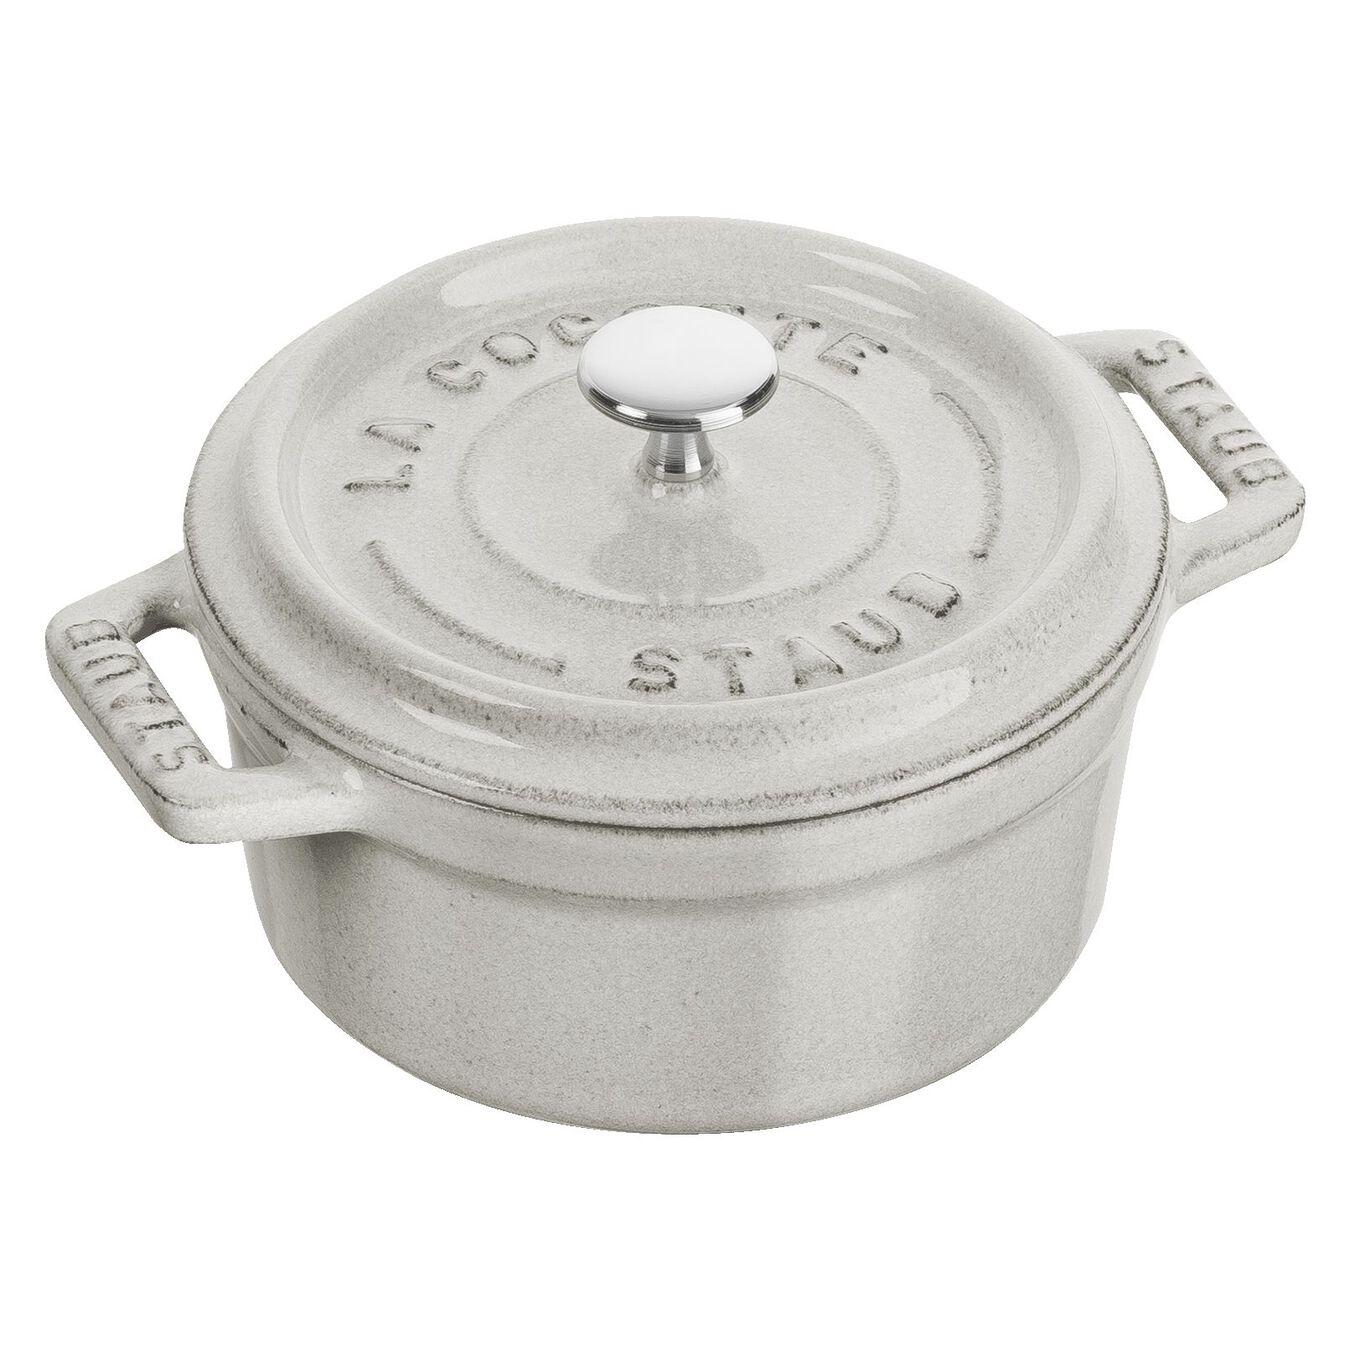 .25-qt Mini Round Cocotte - White Truffle,,large 1